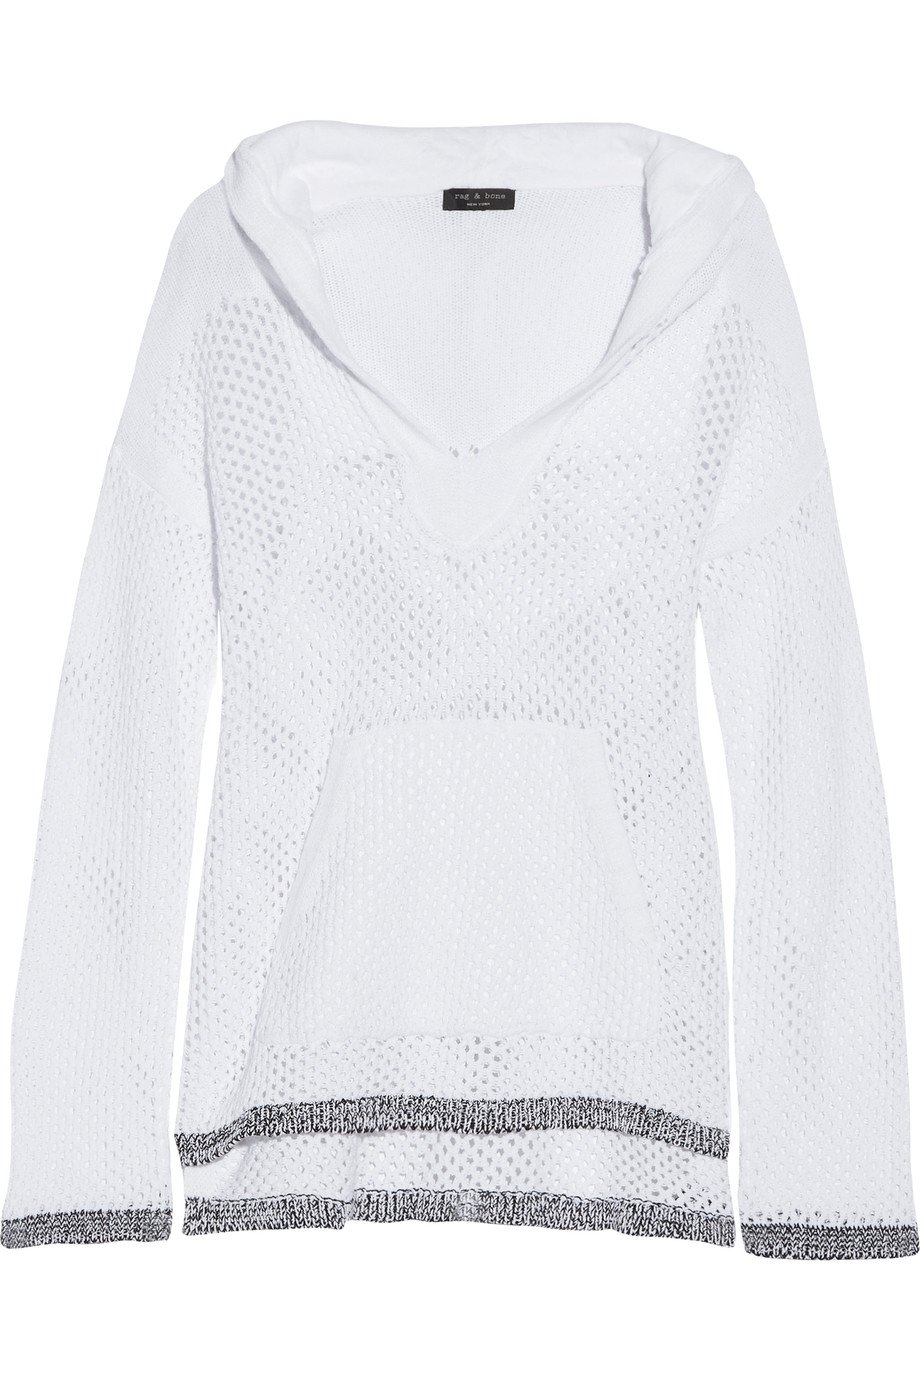 Rag & Bone Thea White Knit Hooded Sweater M